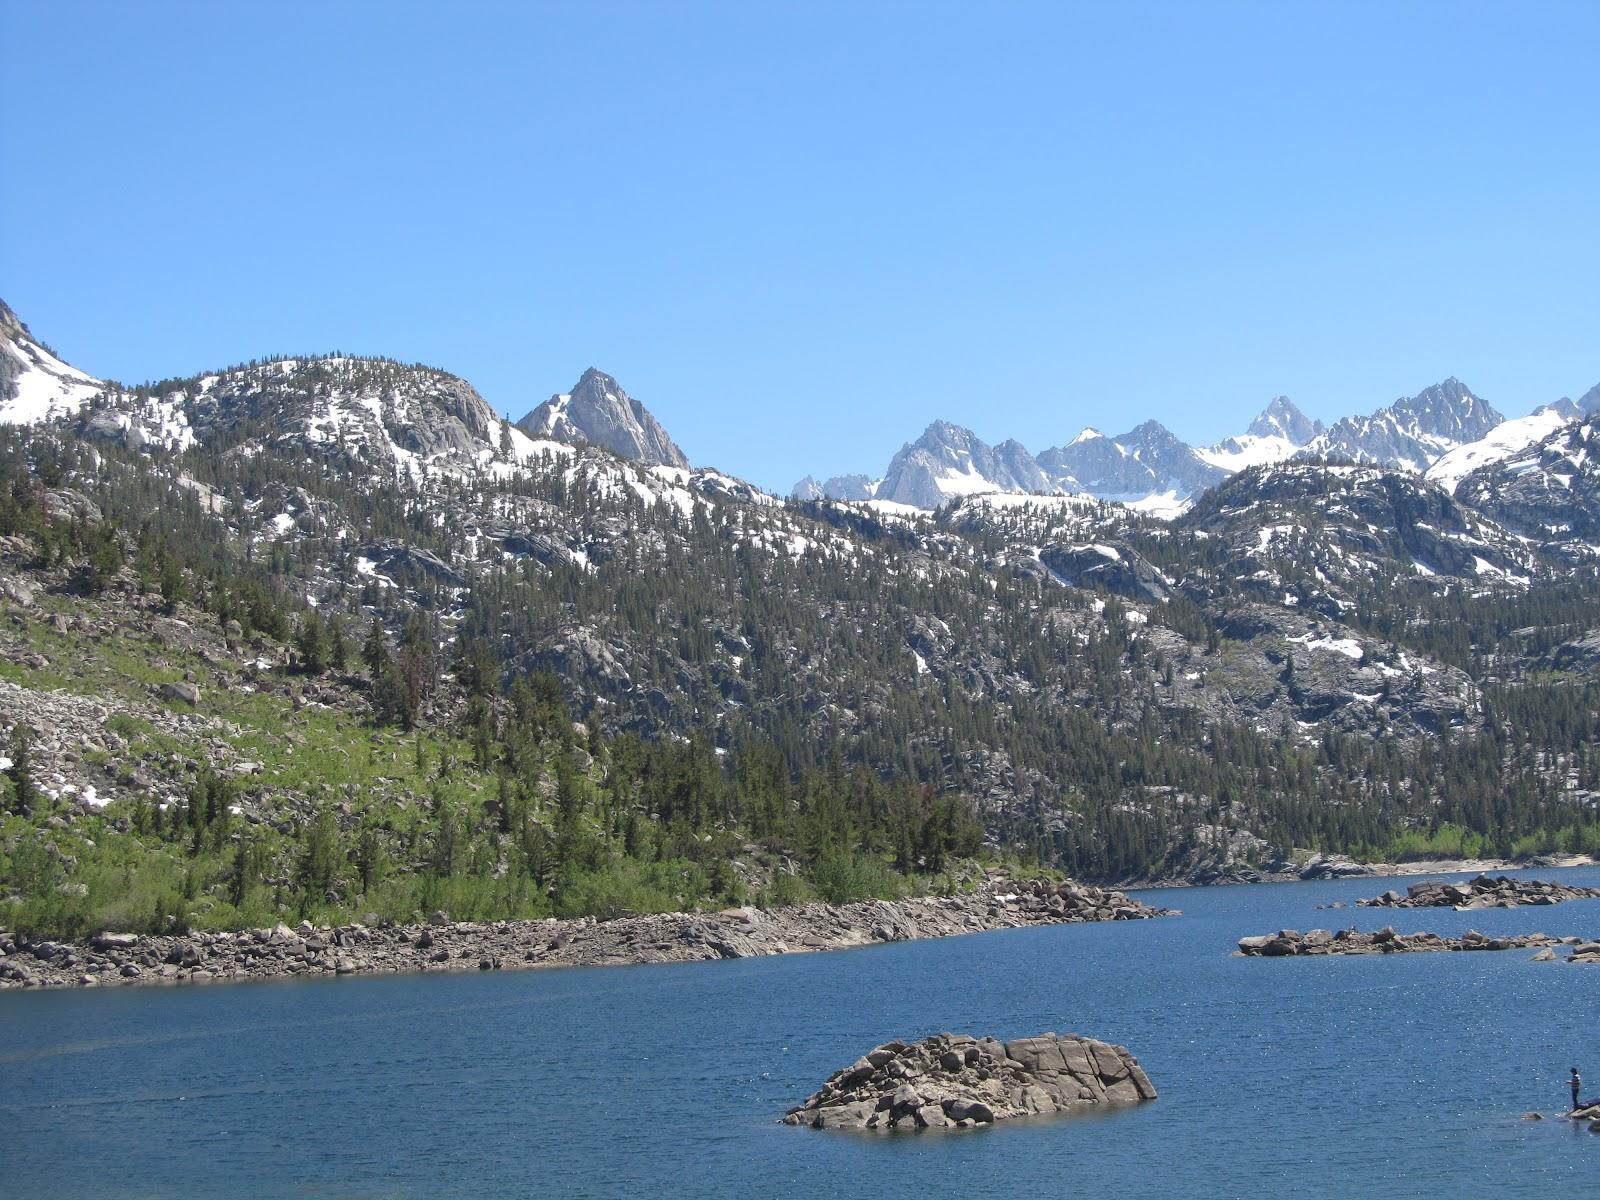 Bicycling South Lake - lake and mountains